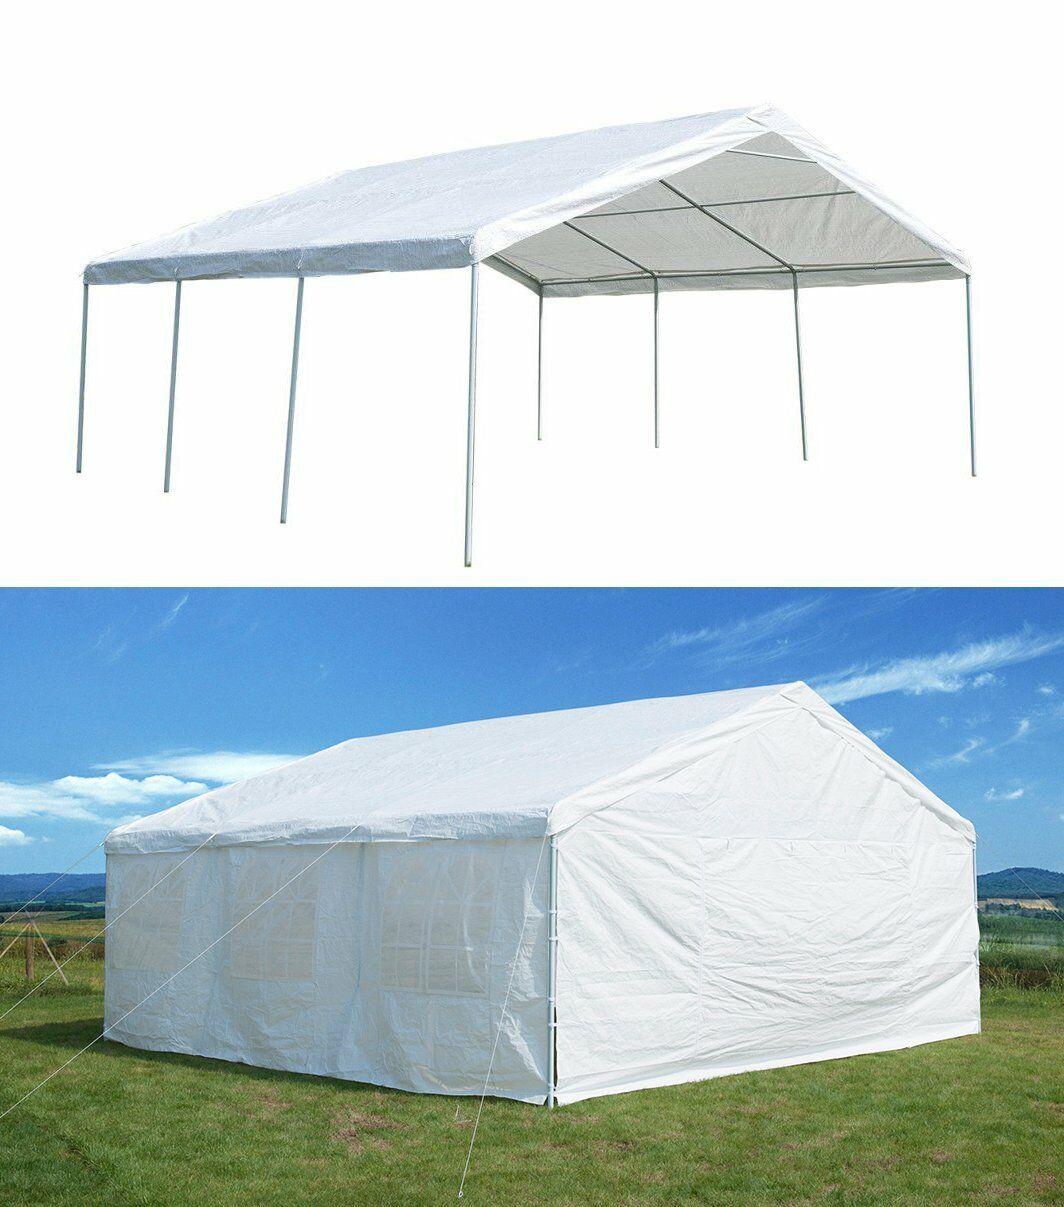 Outdoor Carport 20'x20' Party Tent Canopy Event Wedding Tent